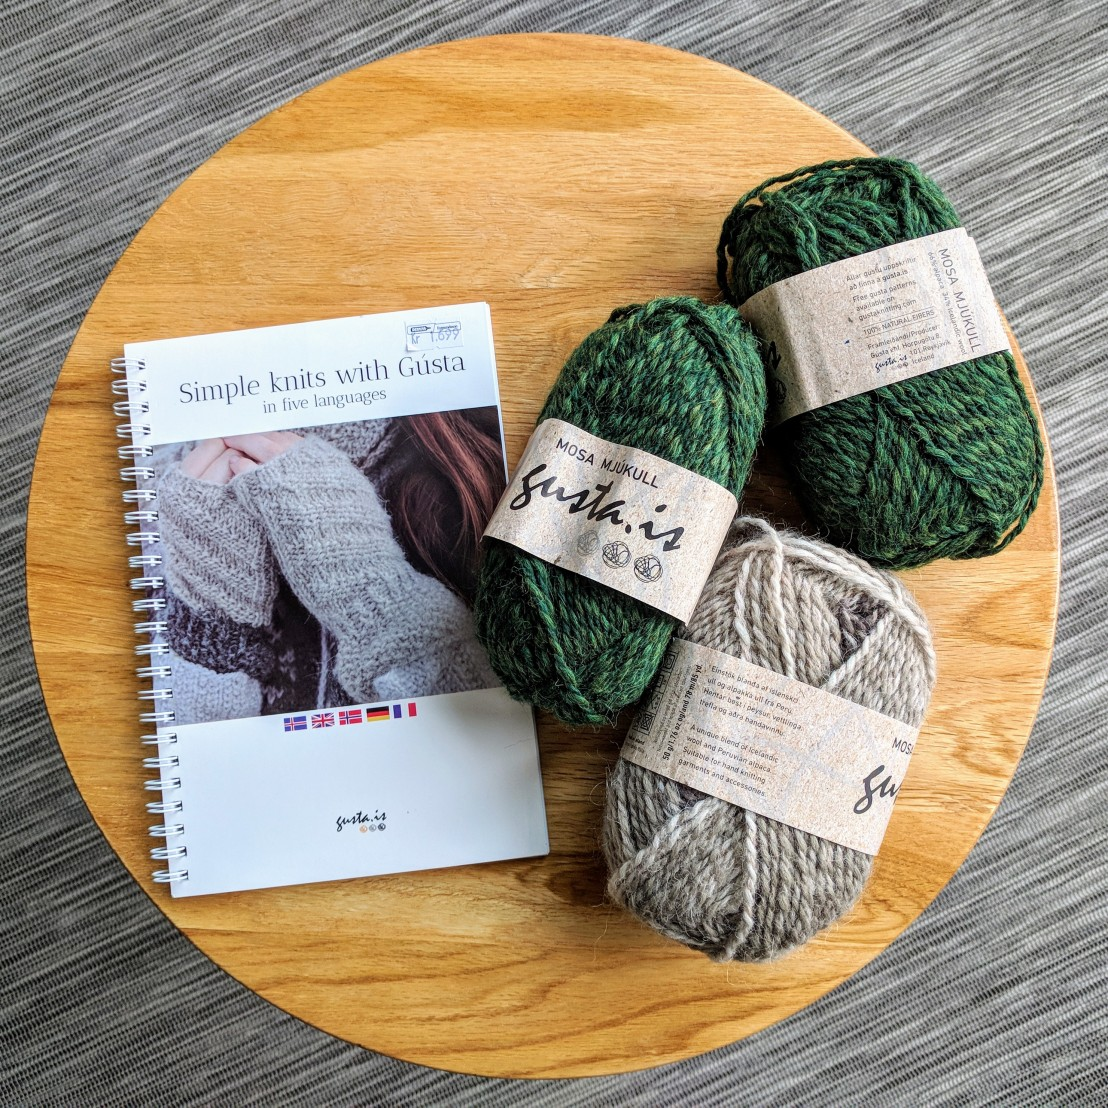 Icelandic patterns and wool